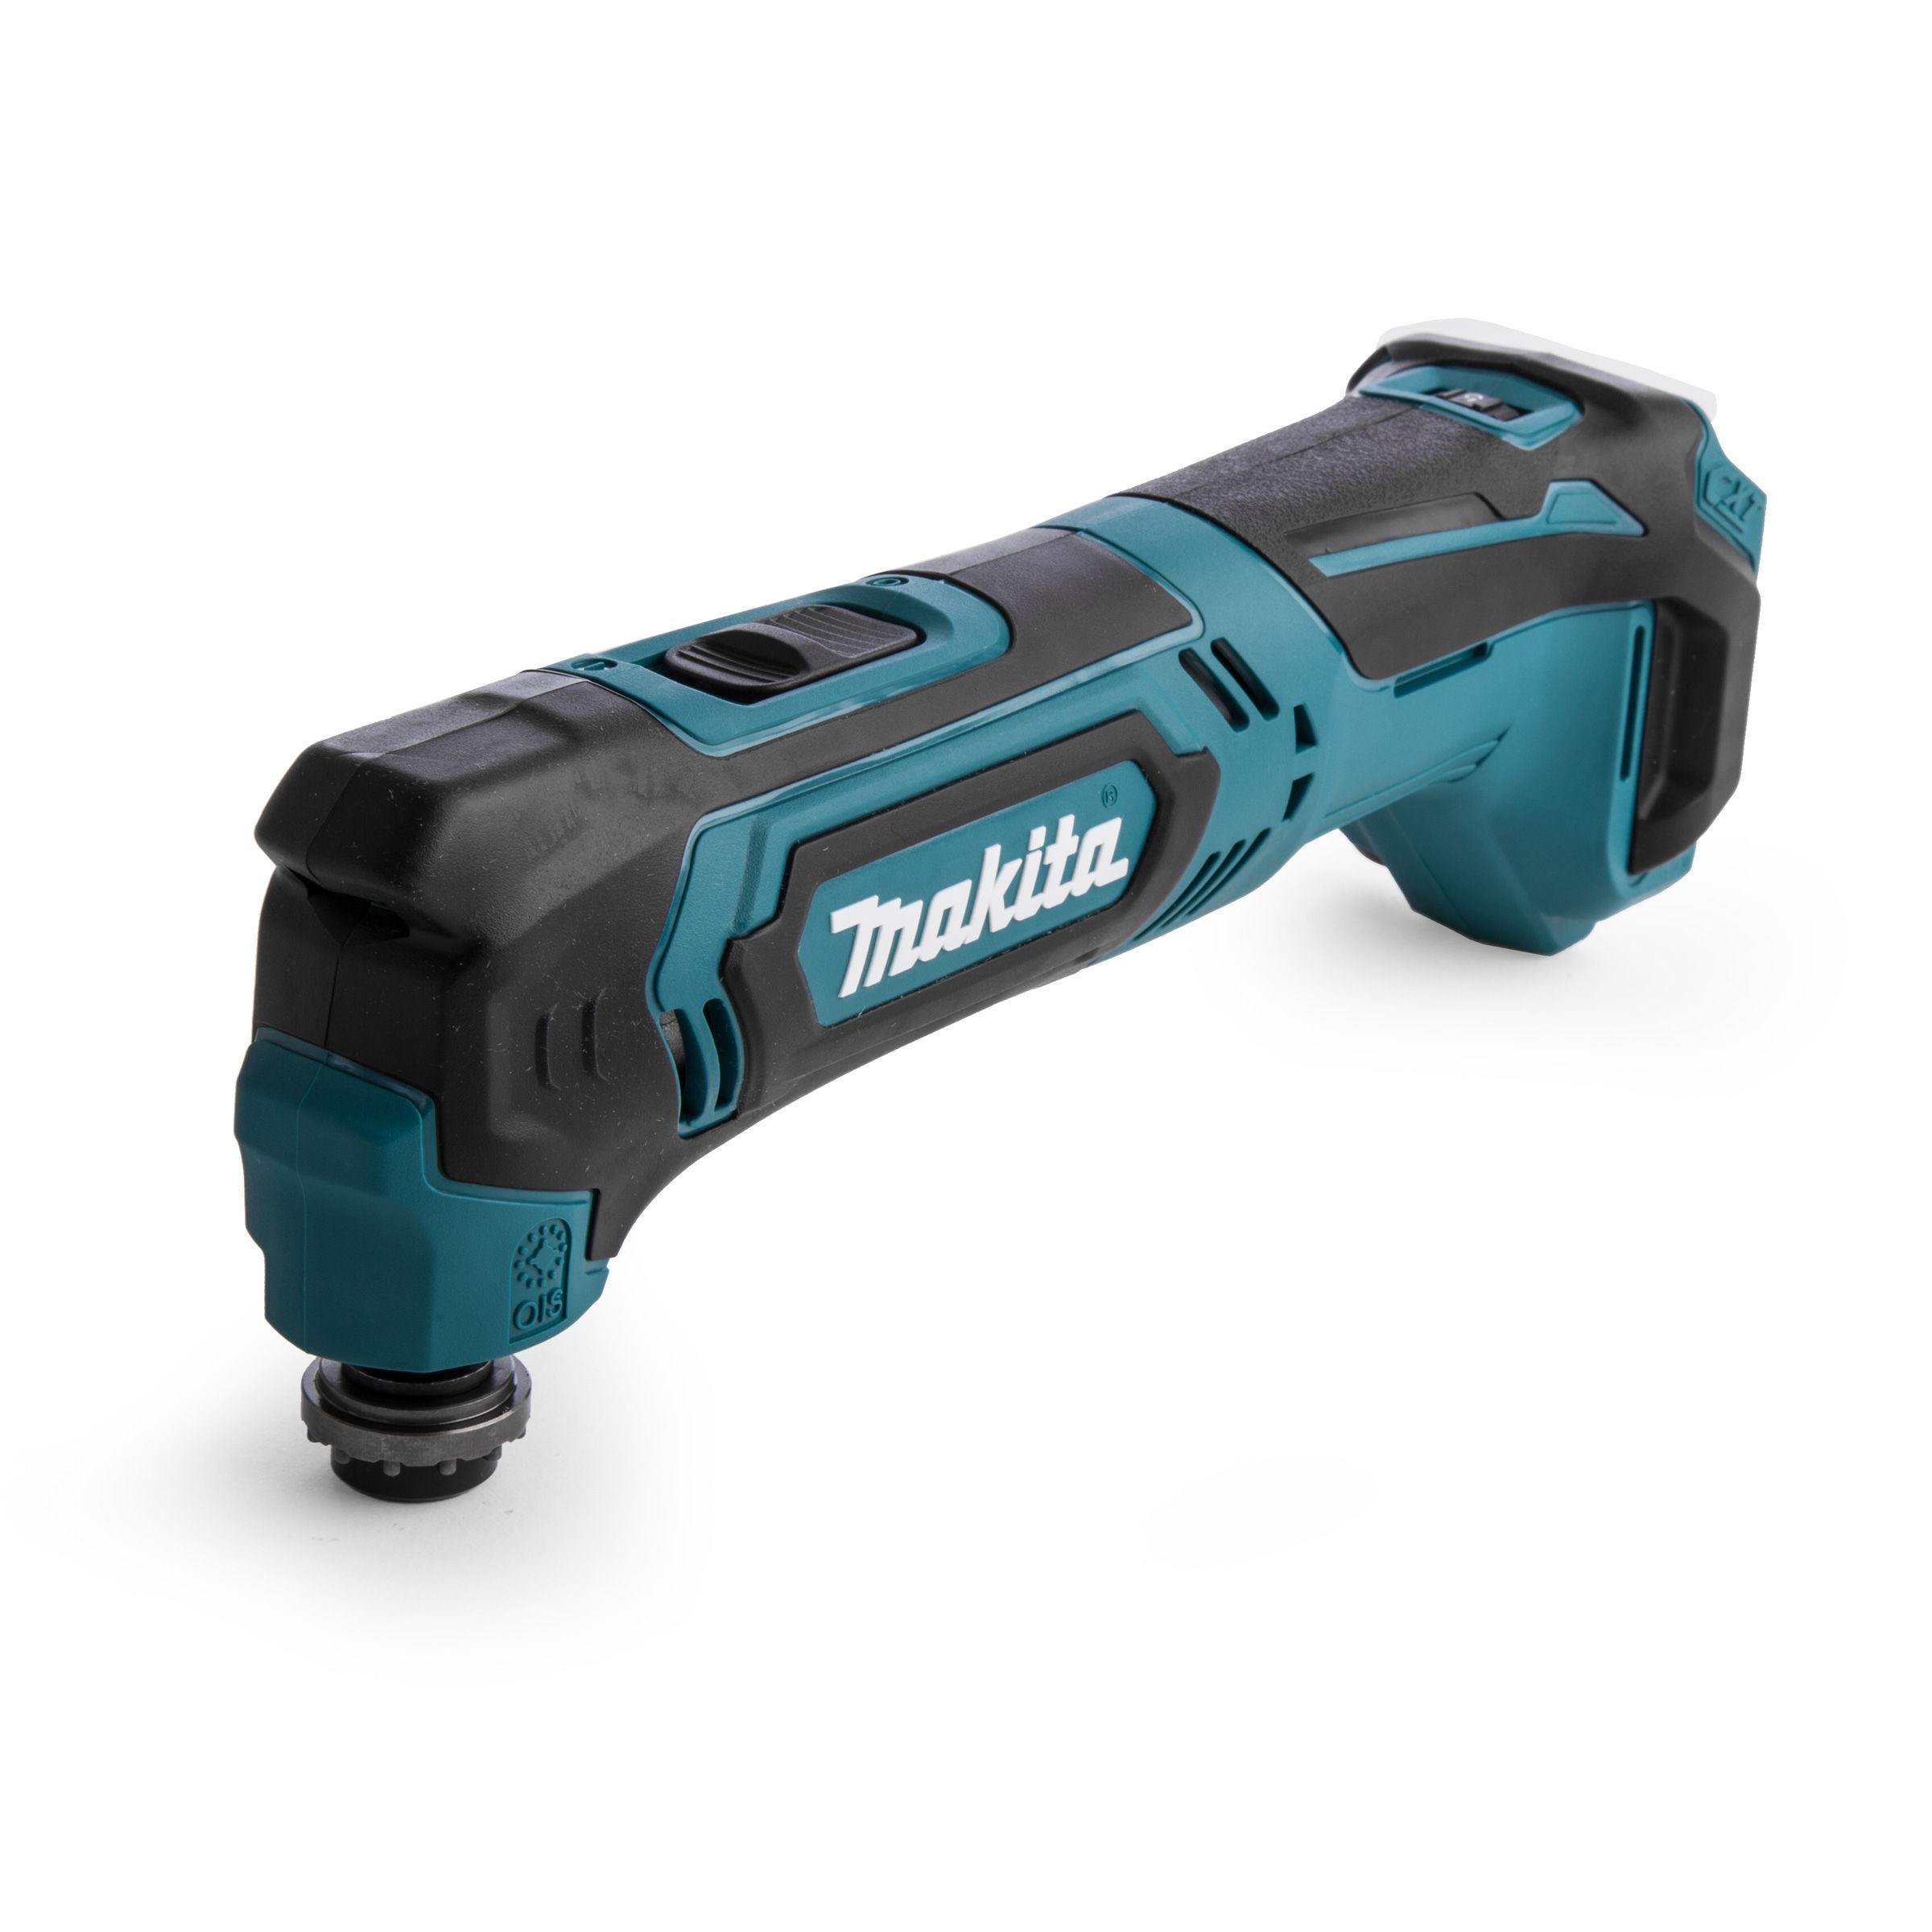 toolstop makita tm30dz multi-tool 10.8v cordless cxt li-ion (body only)